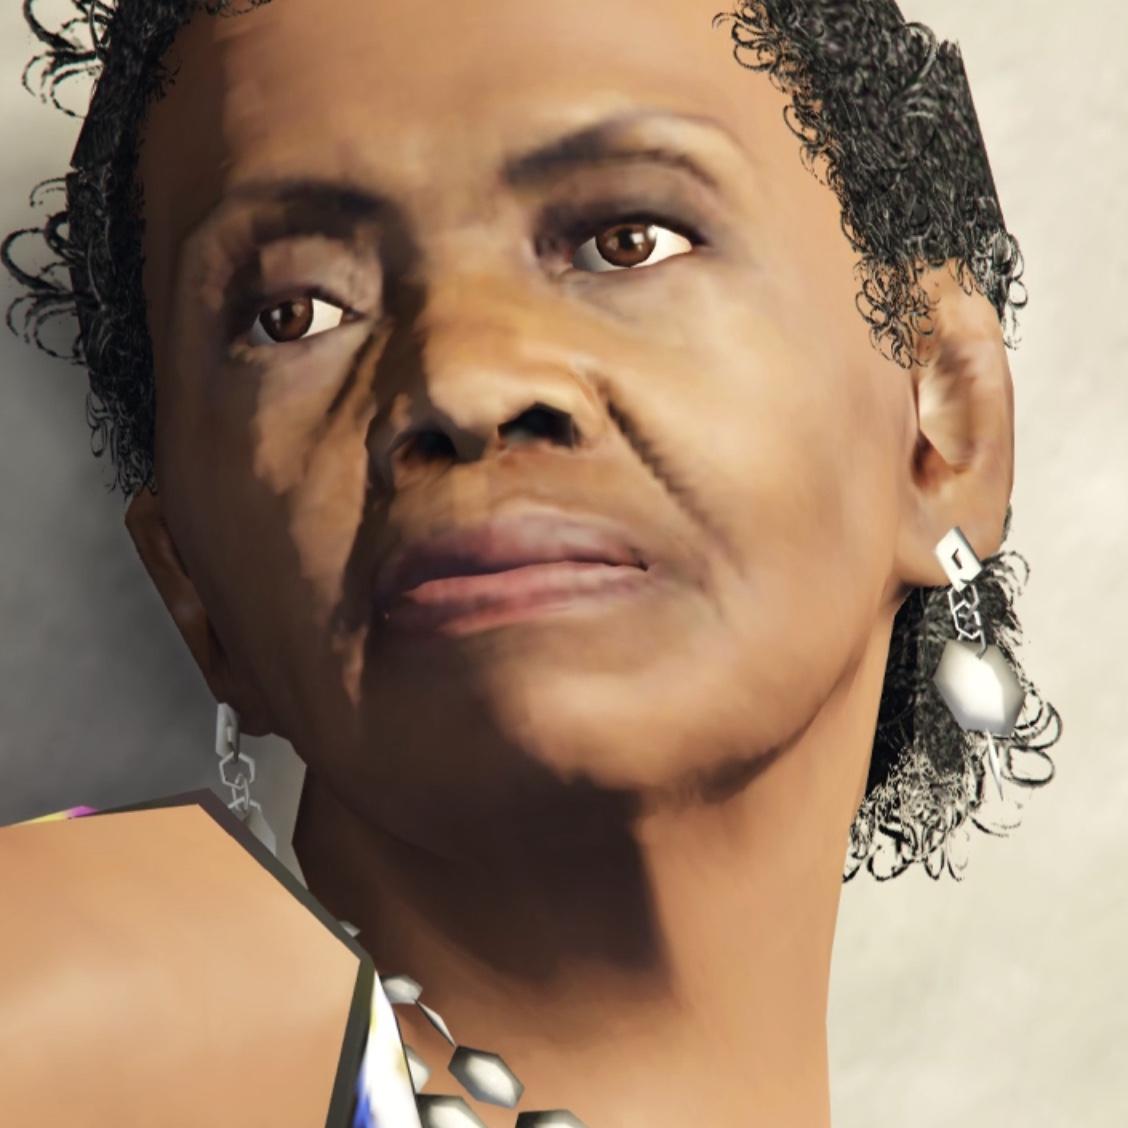 Gladys Berry